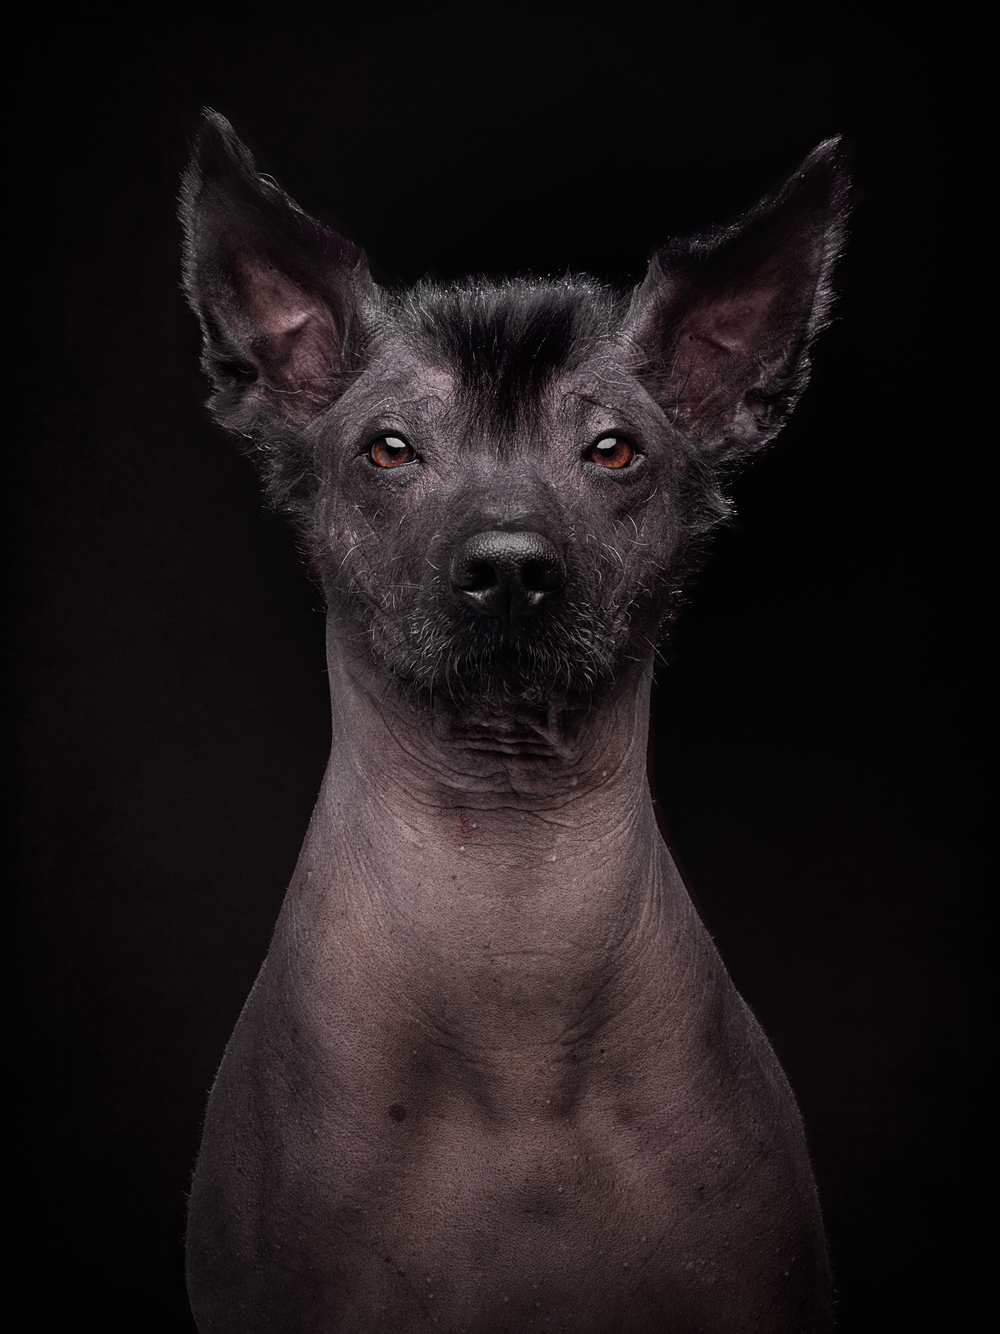 naked-dogs-klausdyba-28.jpg